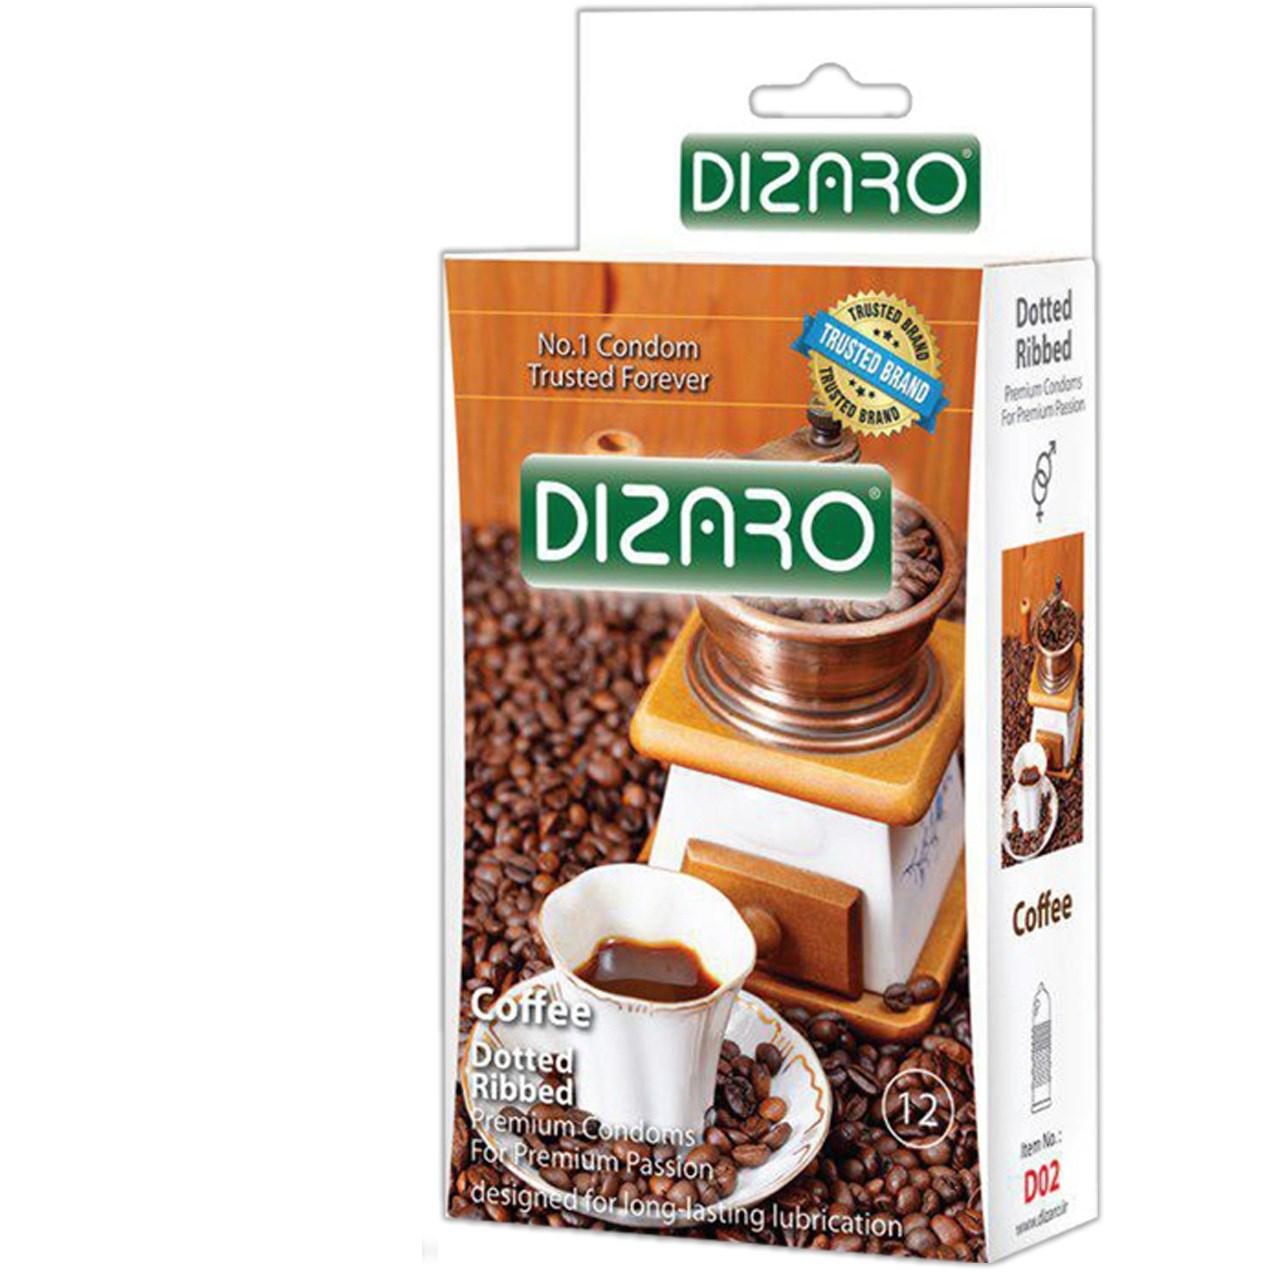 کاندوم دیزارو مدل DOTTED RIBBED COFFEE کد D02 بسته 12 عددی